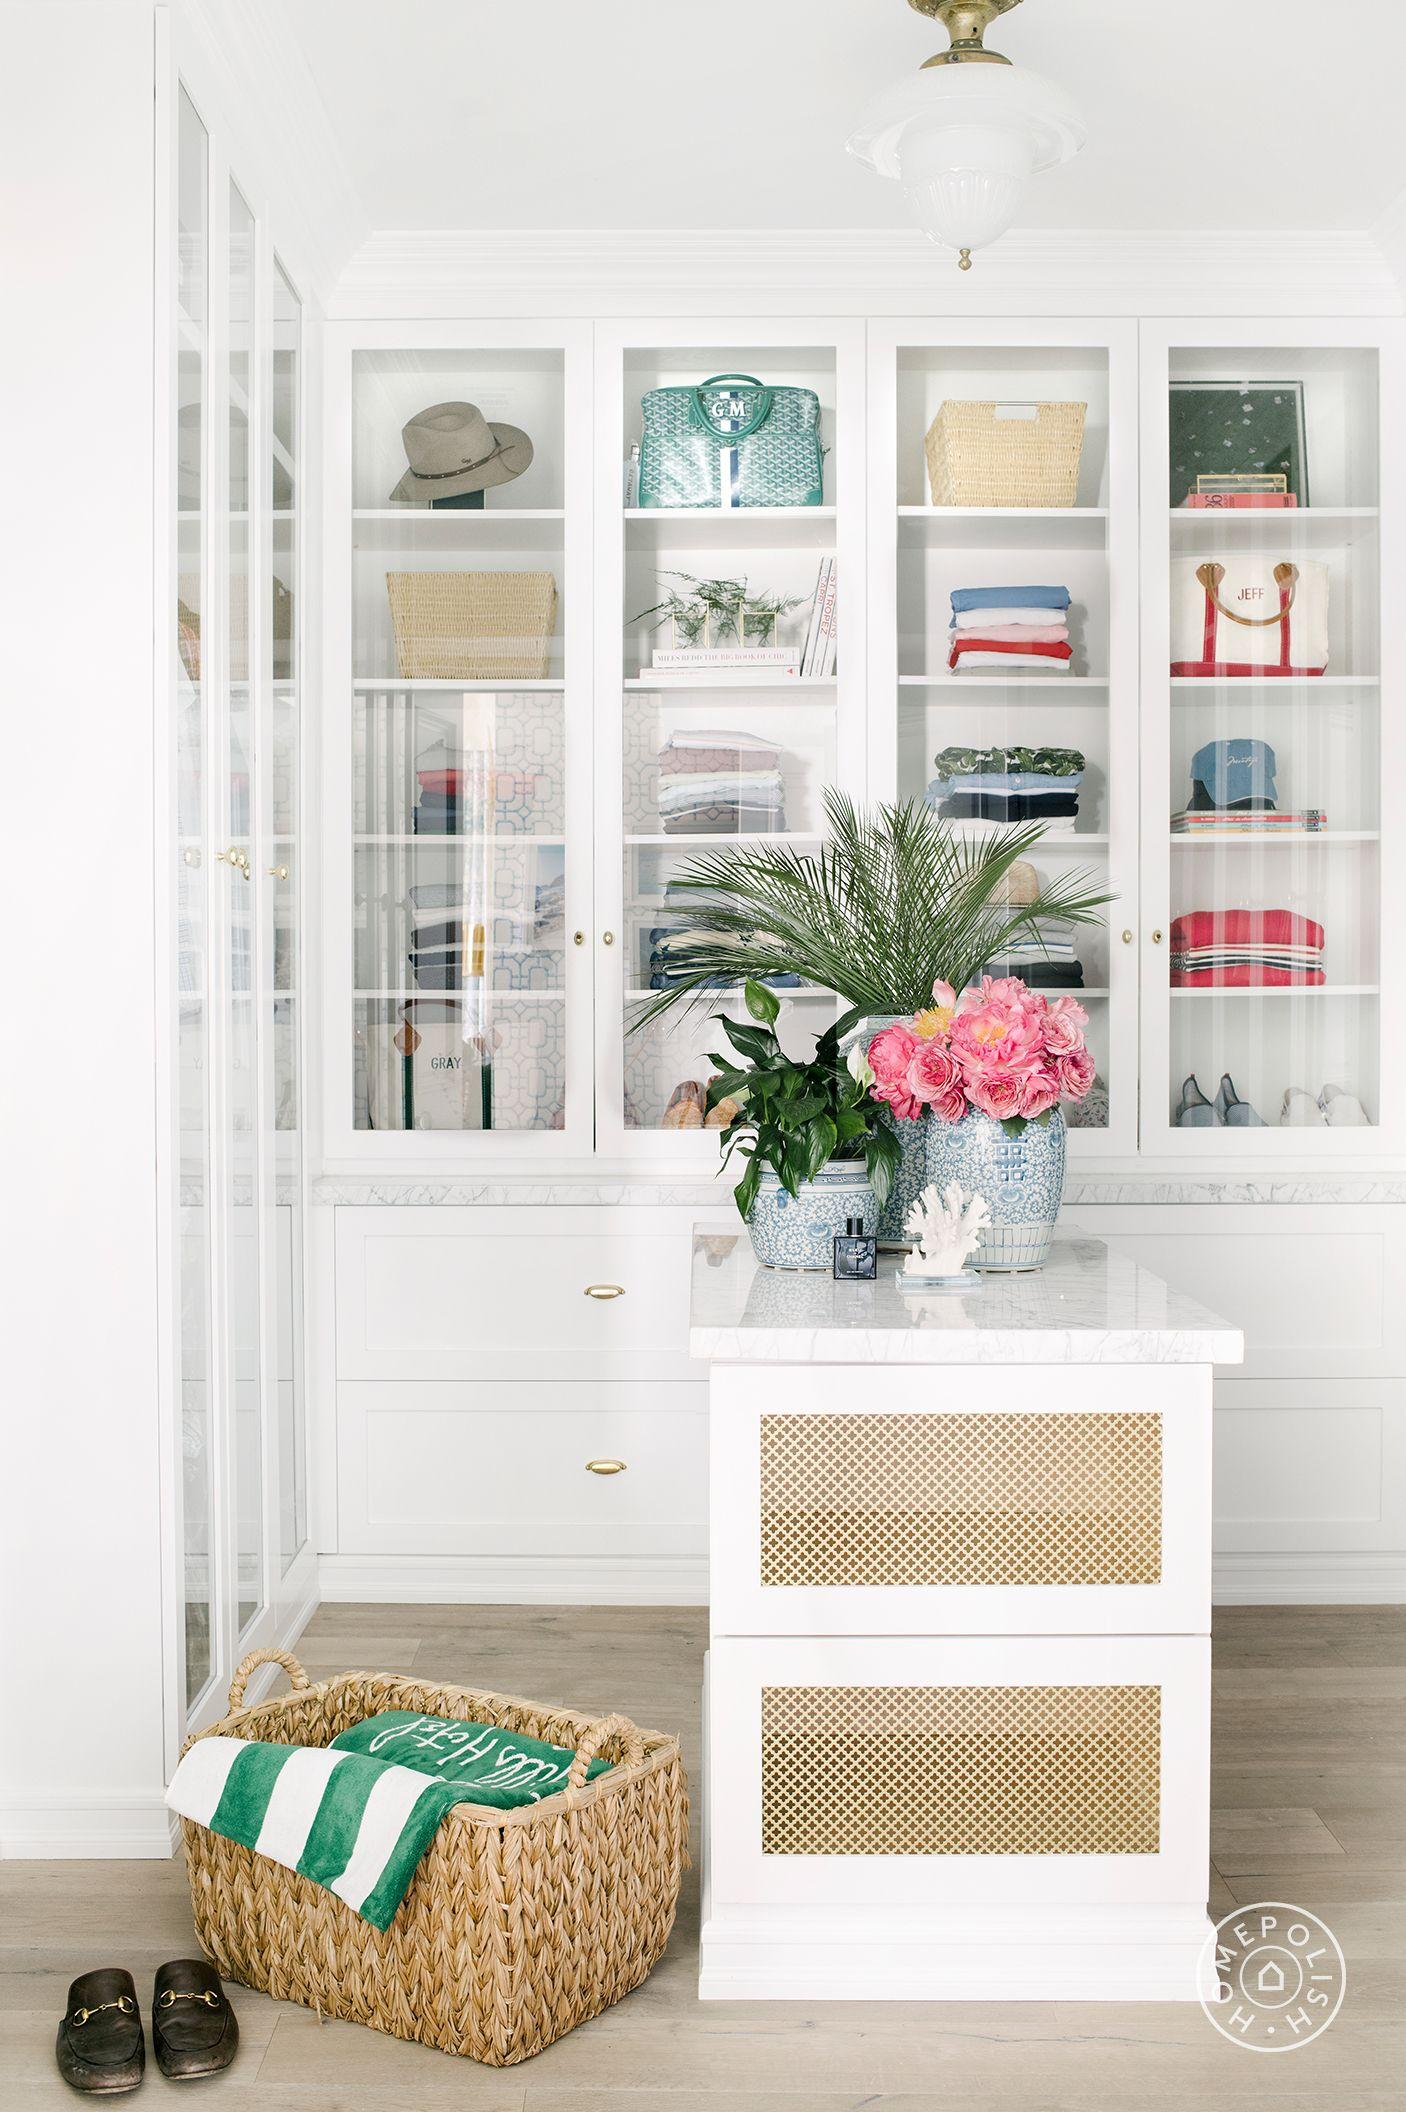 Gray Malin's Bedroom Is the Ultimate Escape | Coastal ...